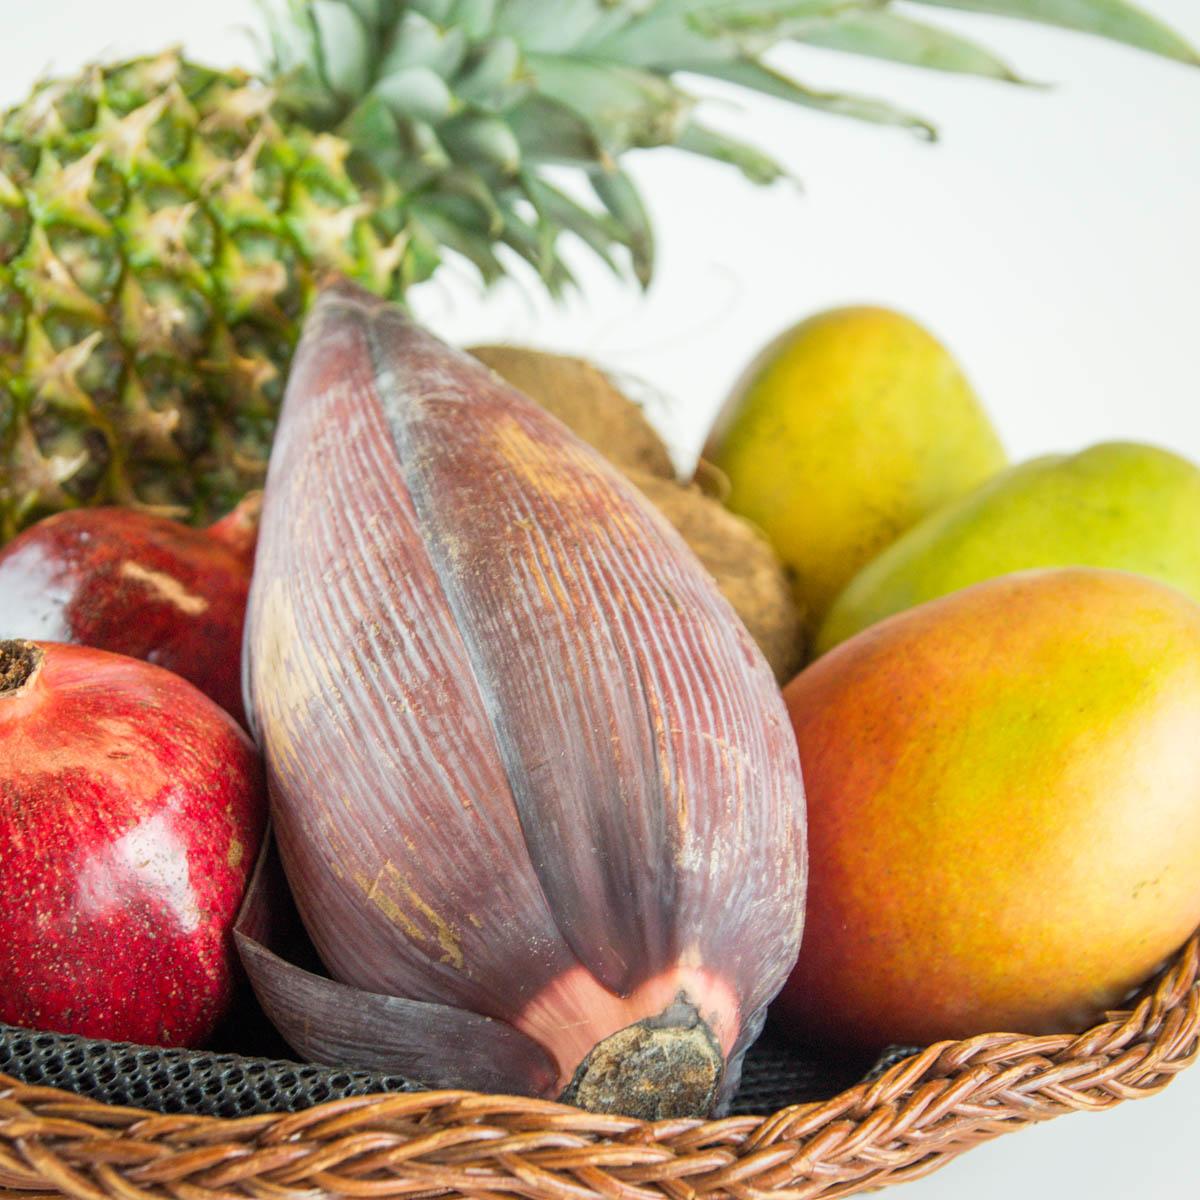 The Produce Exchange